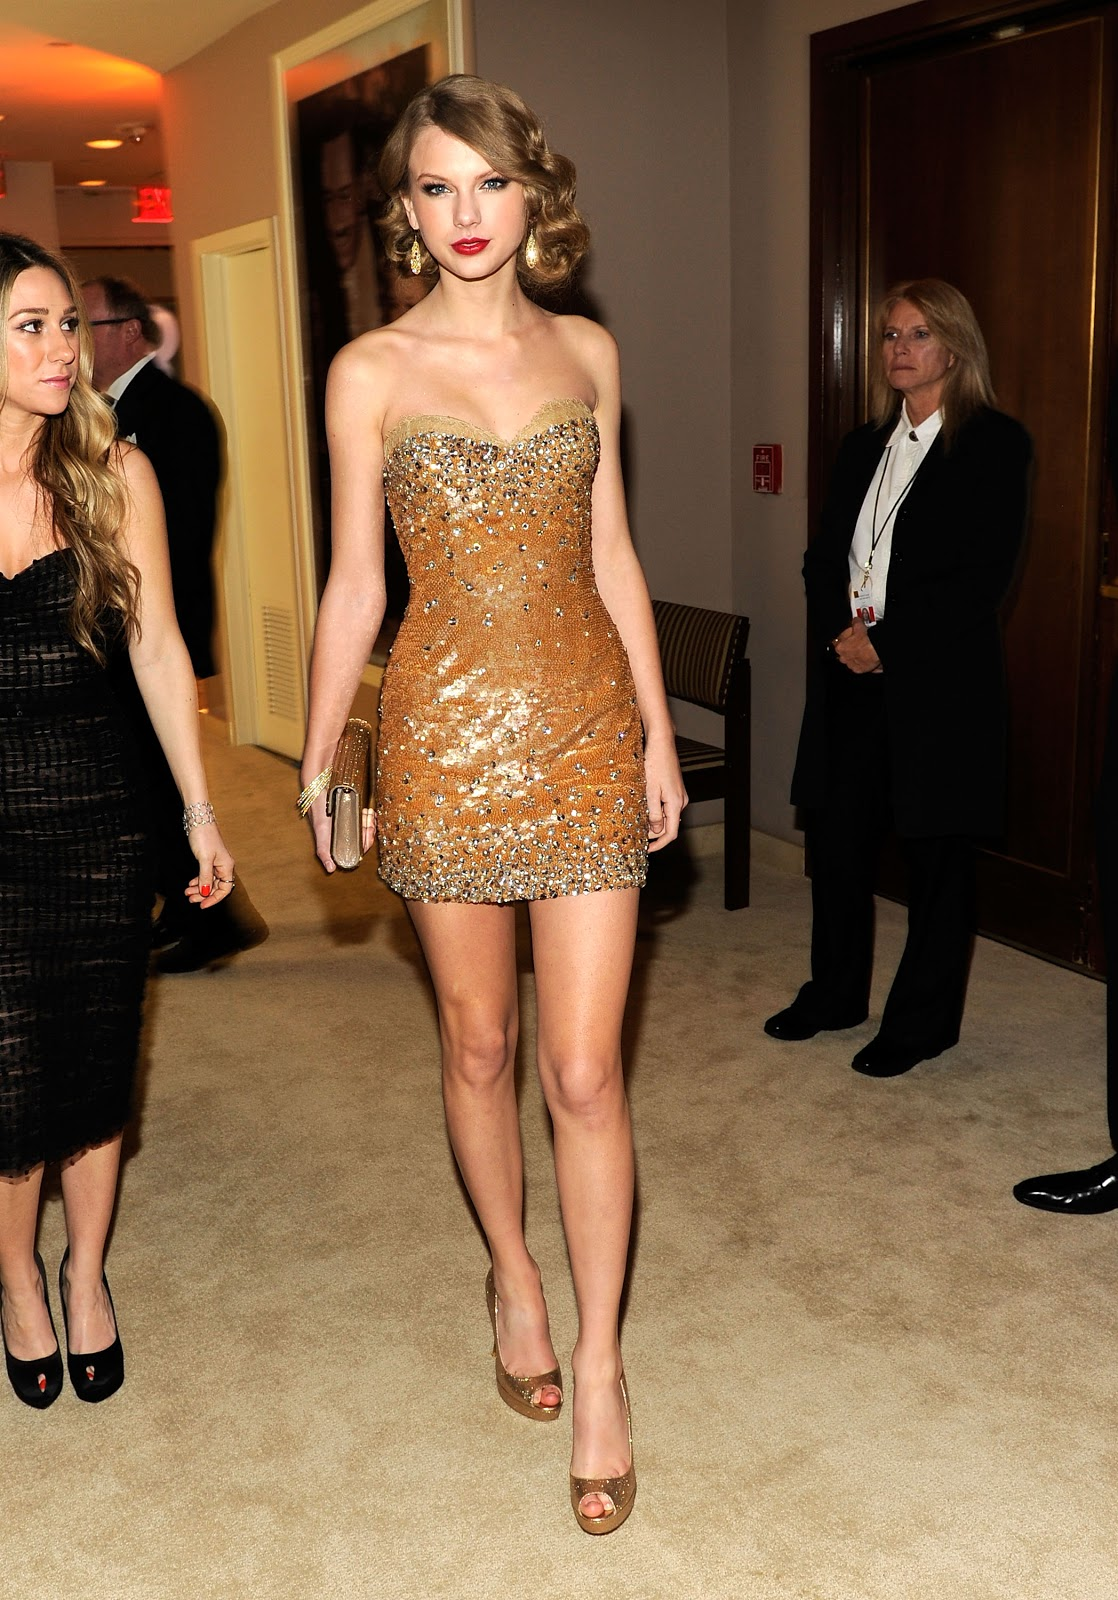 http://2.bp.blogspot.com/-7FW3L1SvXZ8/T4zpUHKoIuI/AAAAAAAADP8/YK-muVvFNRM/s1600/Taylor-Swift-Feet-14.jpg